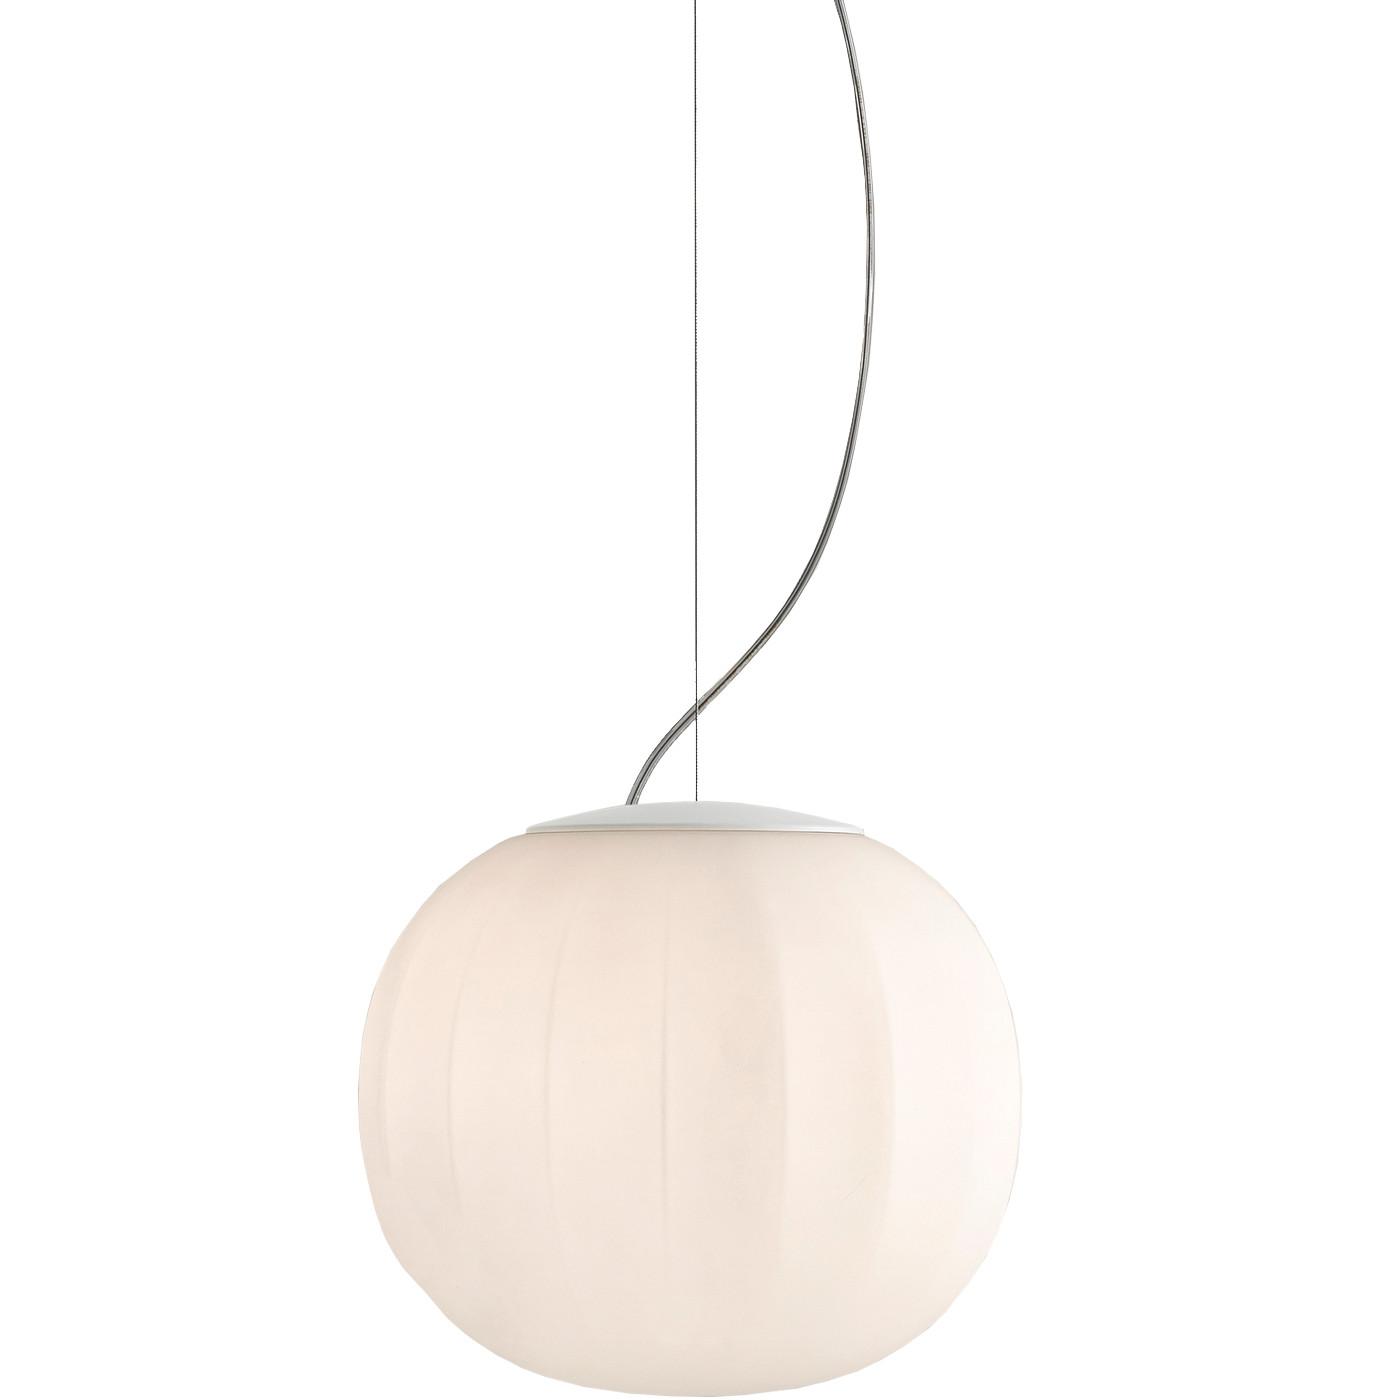 Luceplan Lita 30 Pendant Light